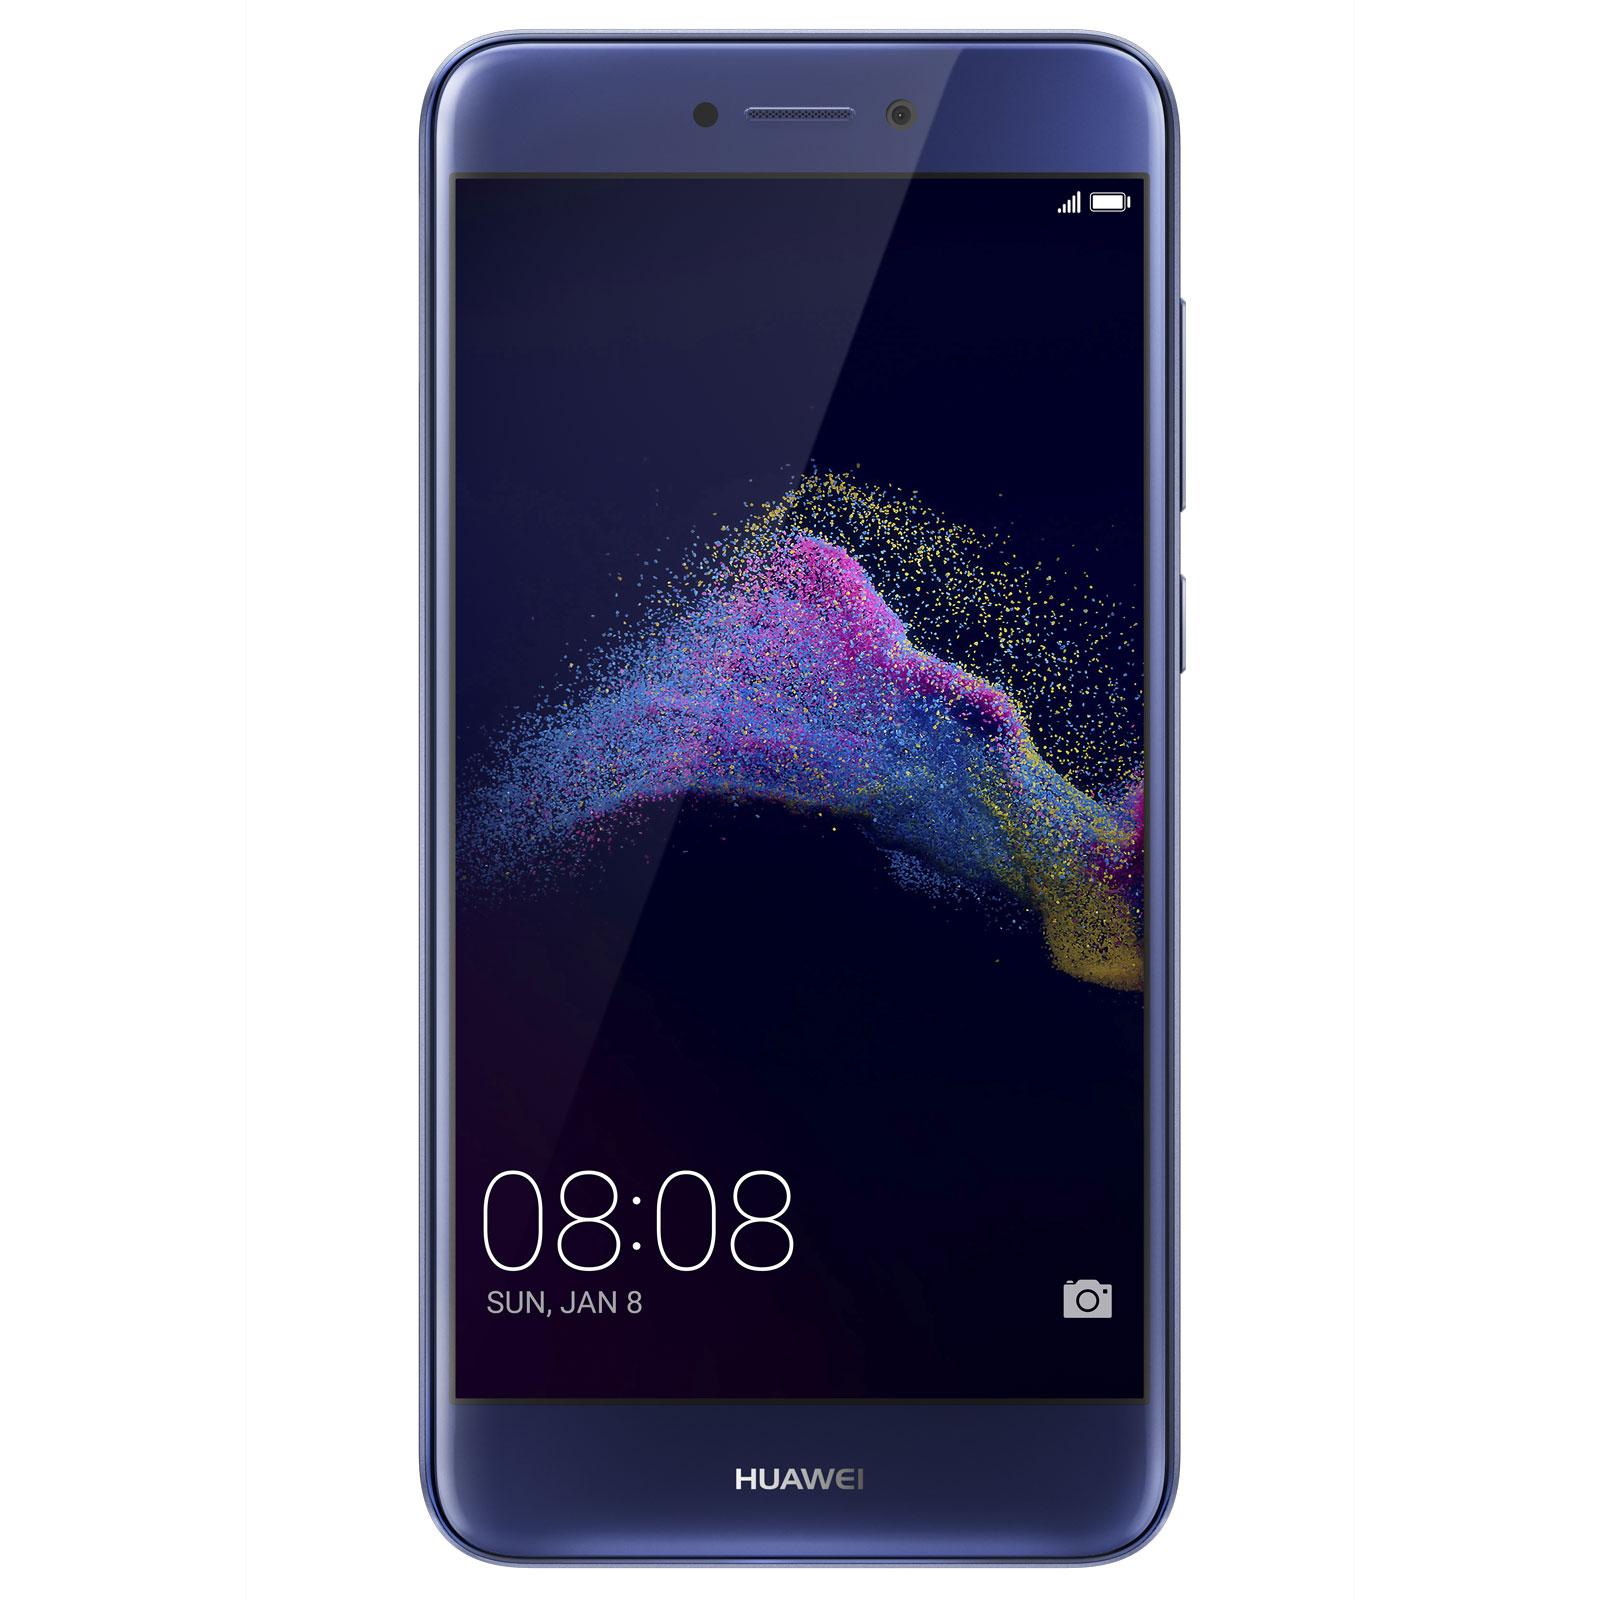 Huawei P8 Lite 2017 Bleu Mobile Amp Smartphone Huawei Sur